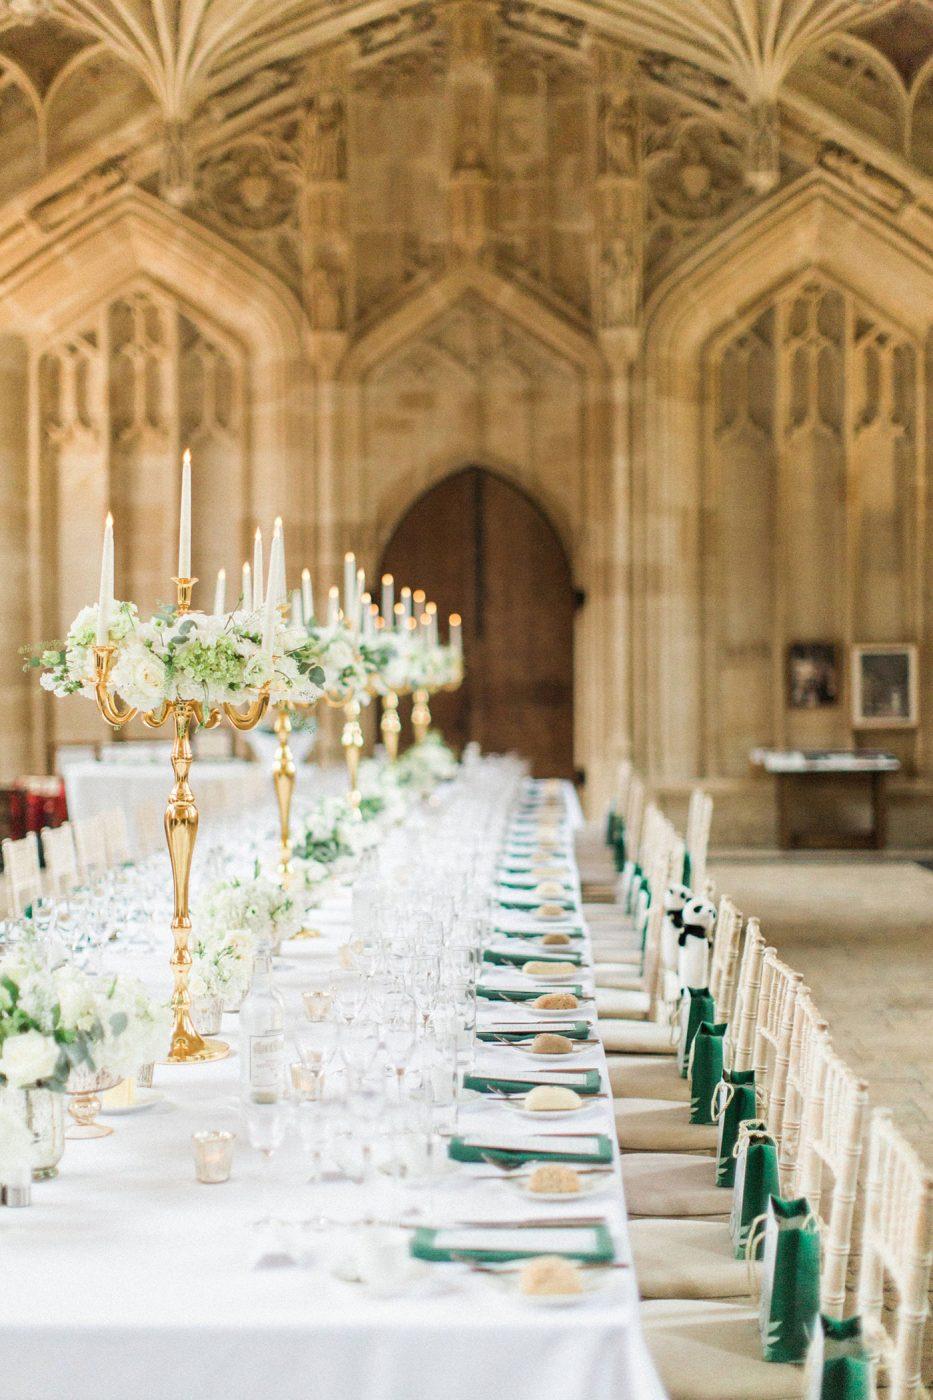 Bodleian Library Wedding Venue